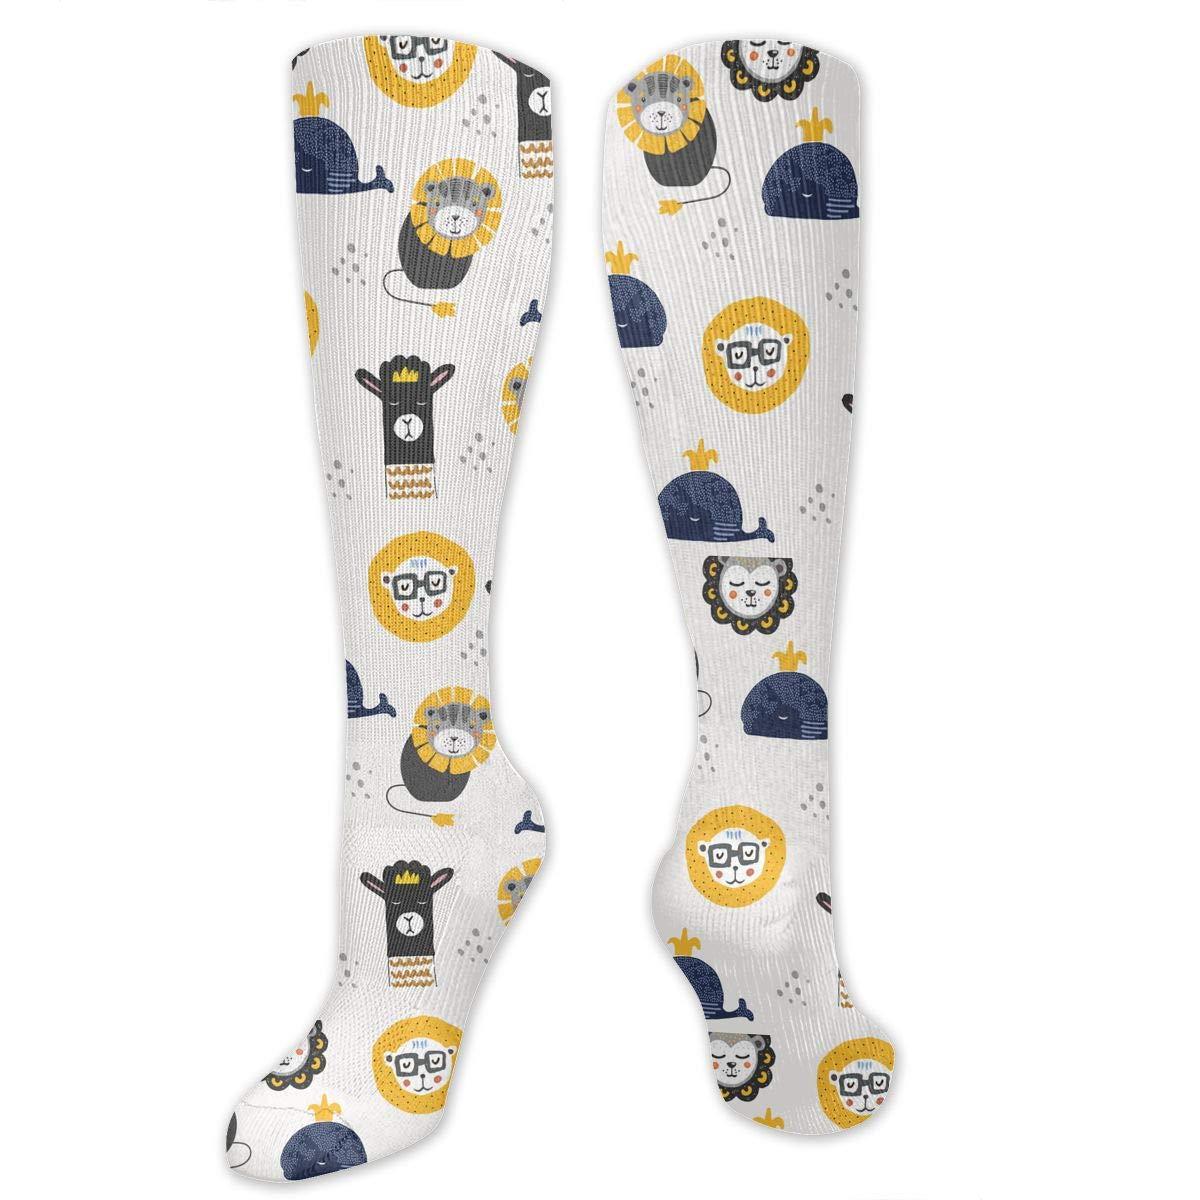 Unisex Lion,llama And Whale Pattern Knee High Compression Thigh High Socks Soft Socks